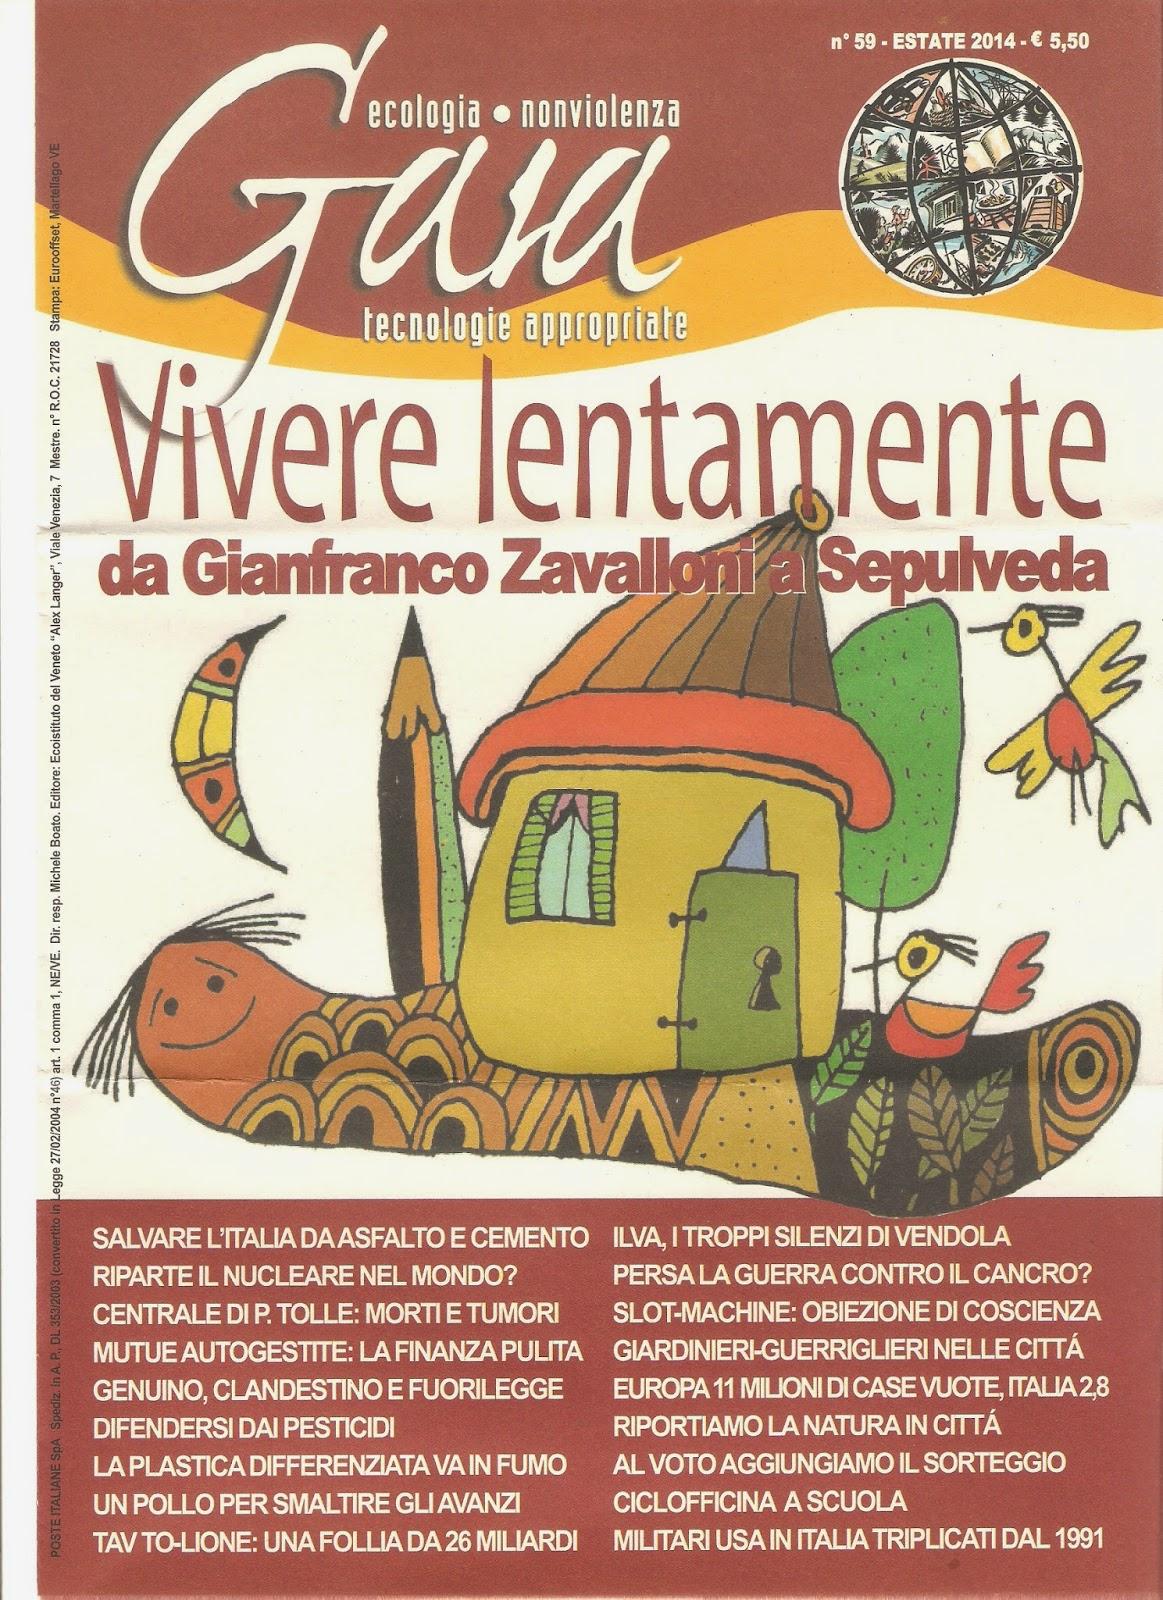 www.ecoistituto-italia.org